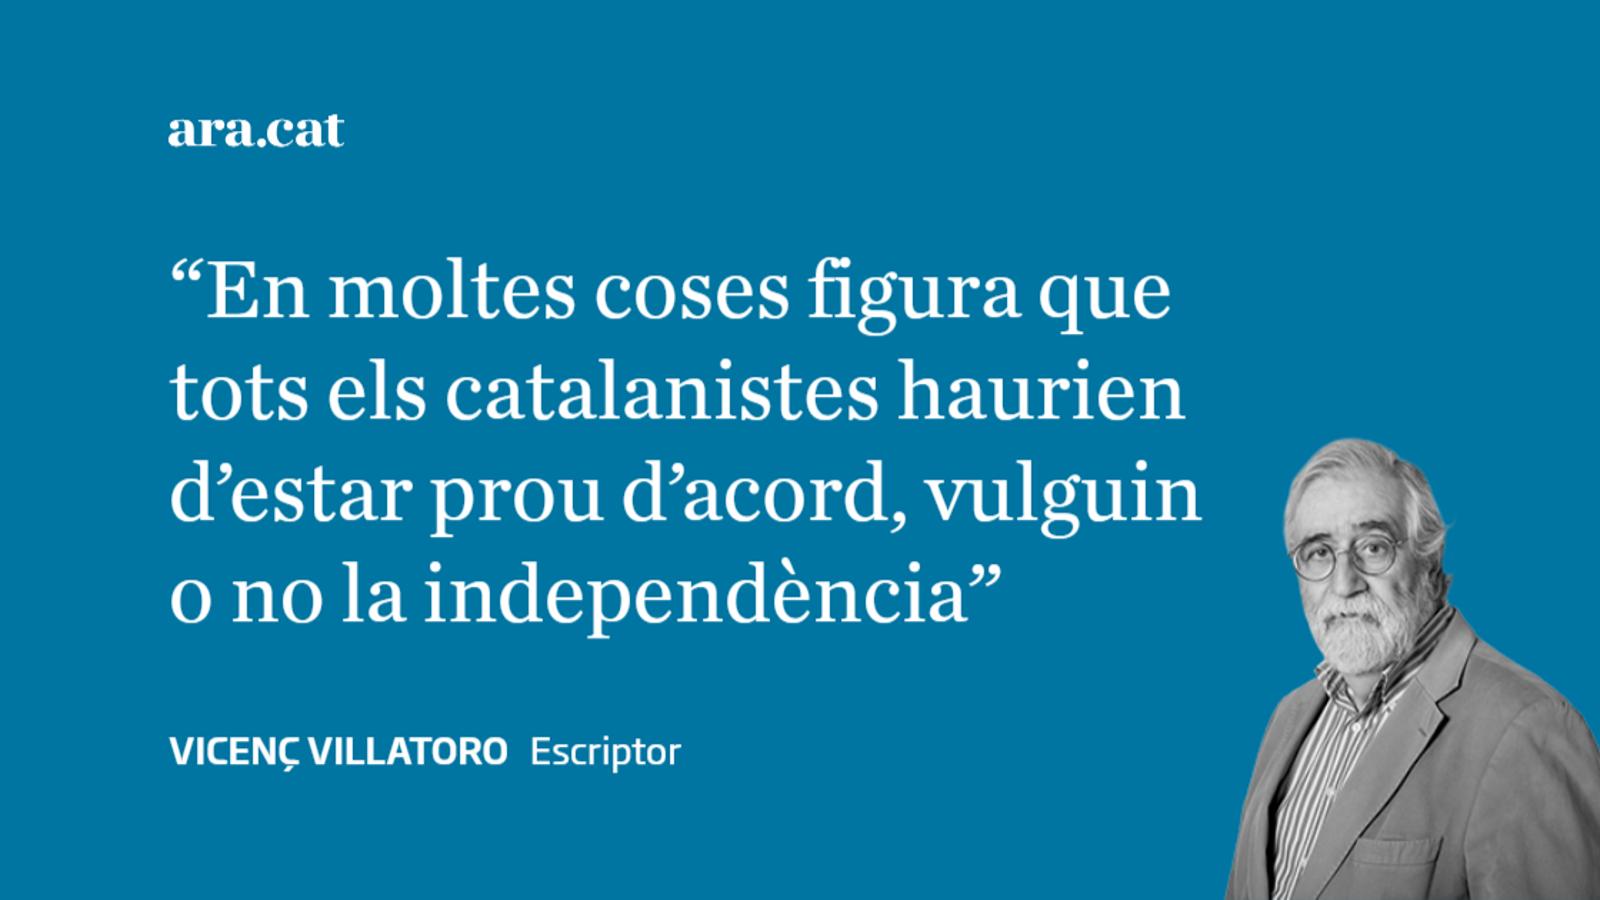 25/2: Catalanistes